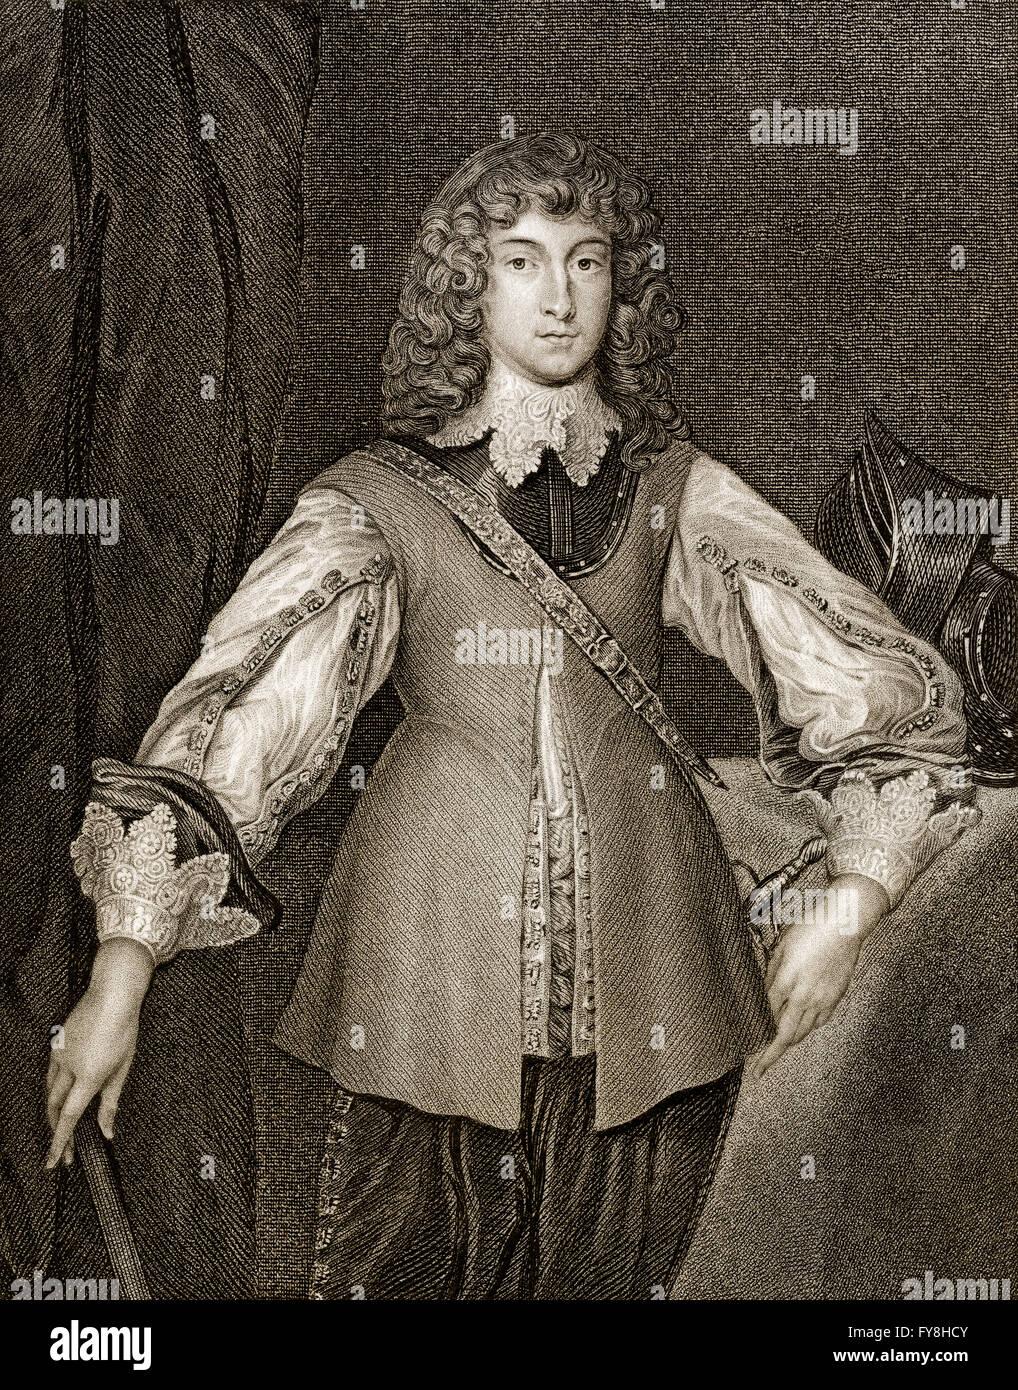 Rupert, Count Palatine of the Rhine, Duke of Bavaria, Duke of Cumberland, Earl of Holderness, Prince Rupert of the Stock Photo